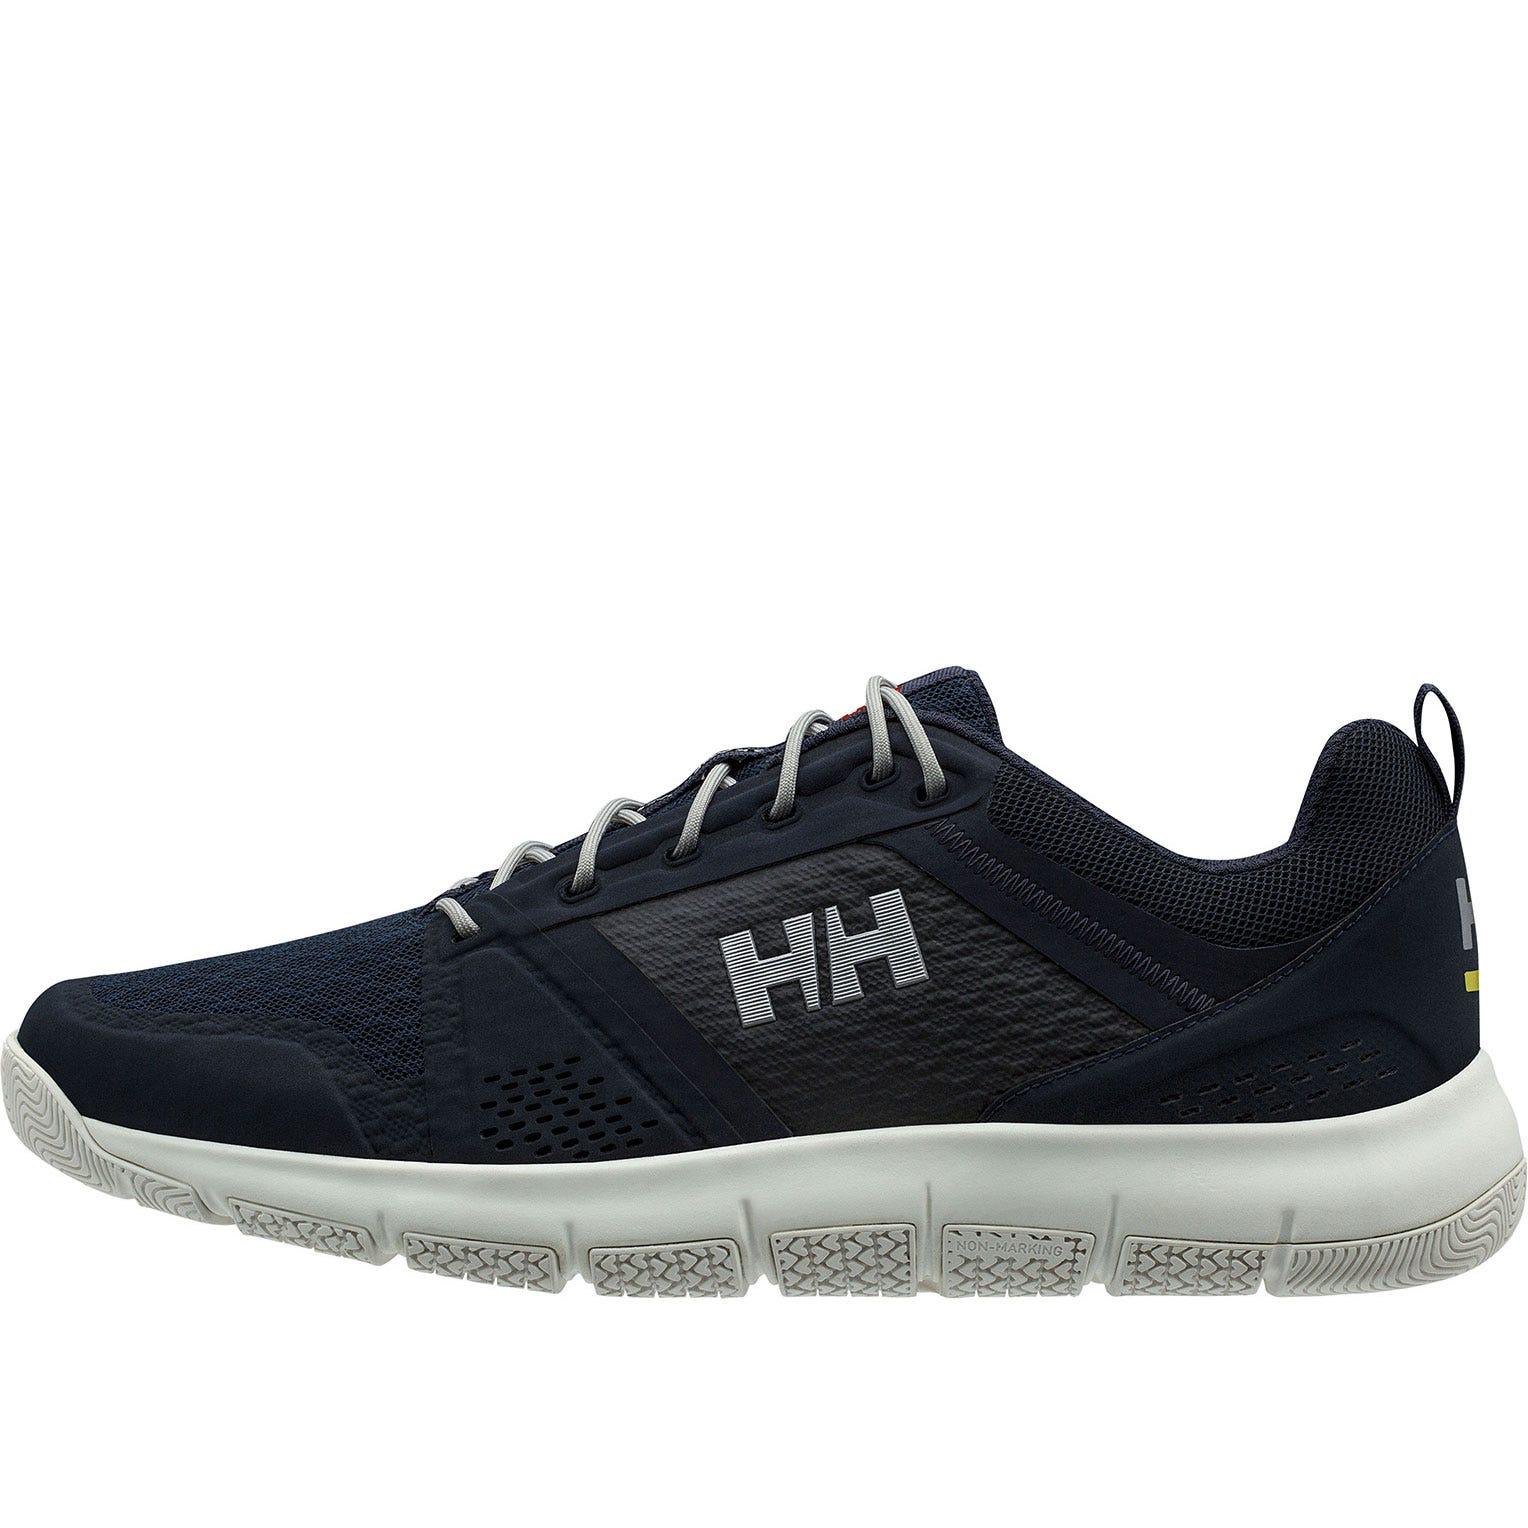 Helly Hansen Mens Sailing Shoe Navy 6.5